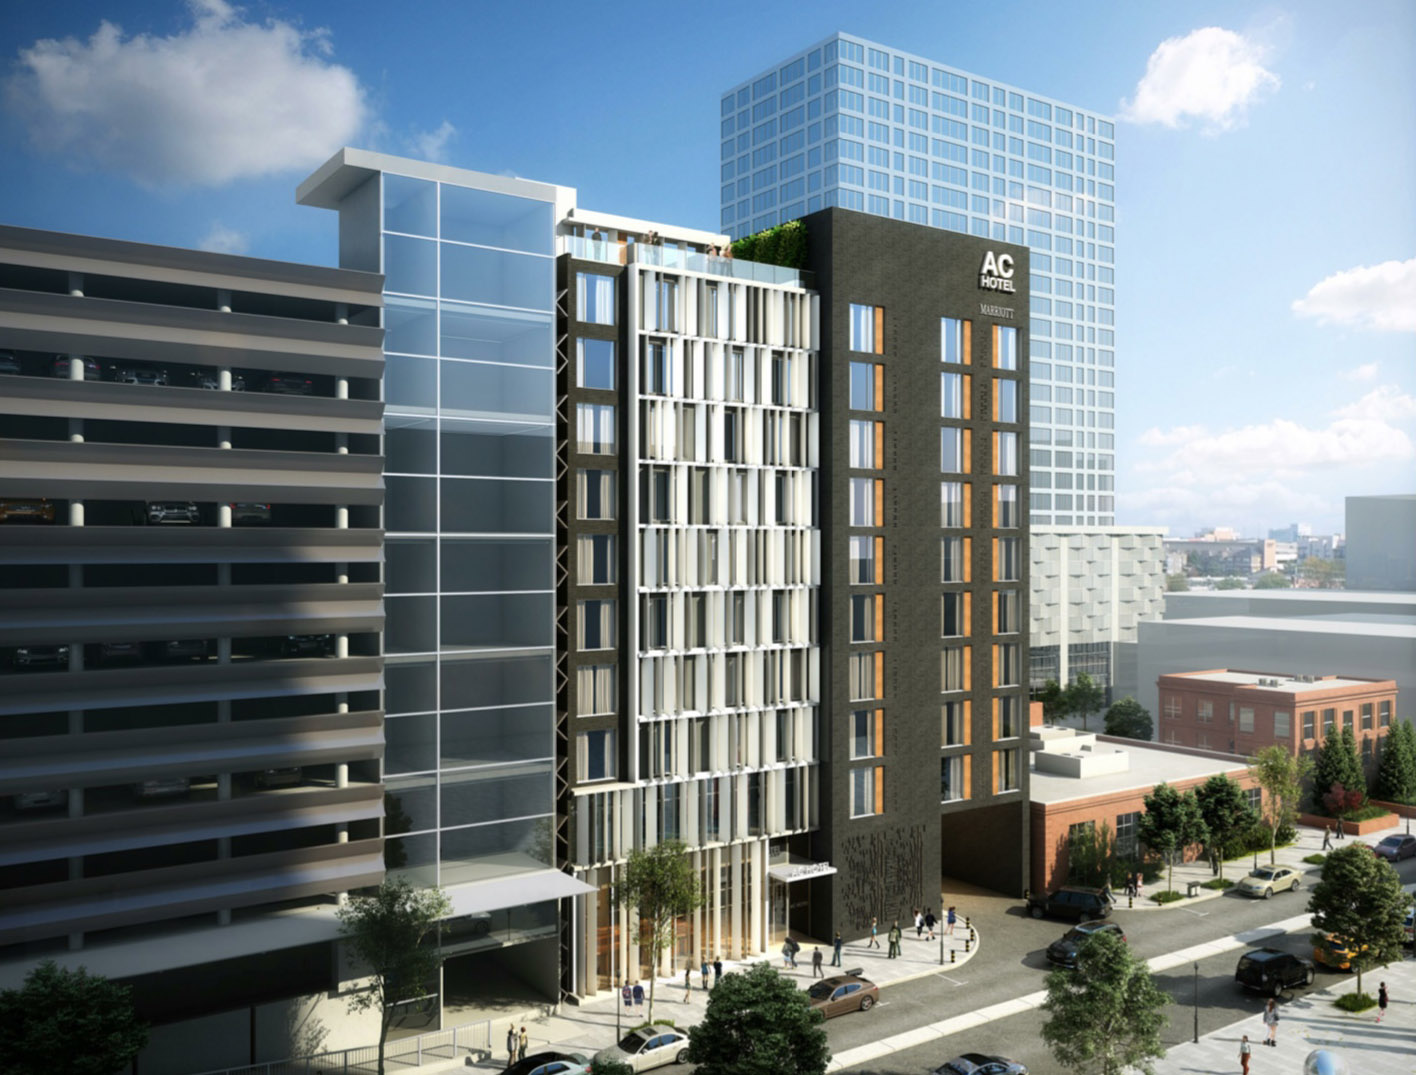 AC Hotel by Marriott in Clayton moves forward